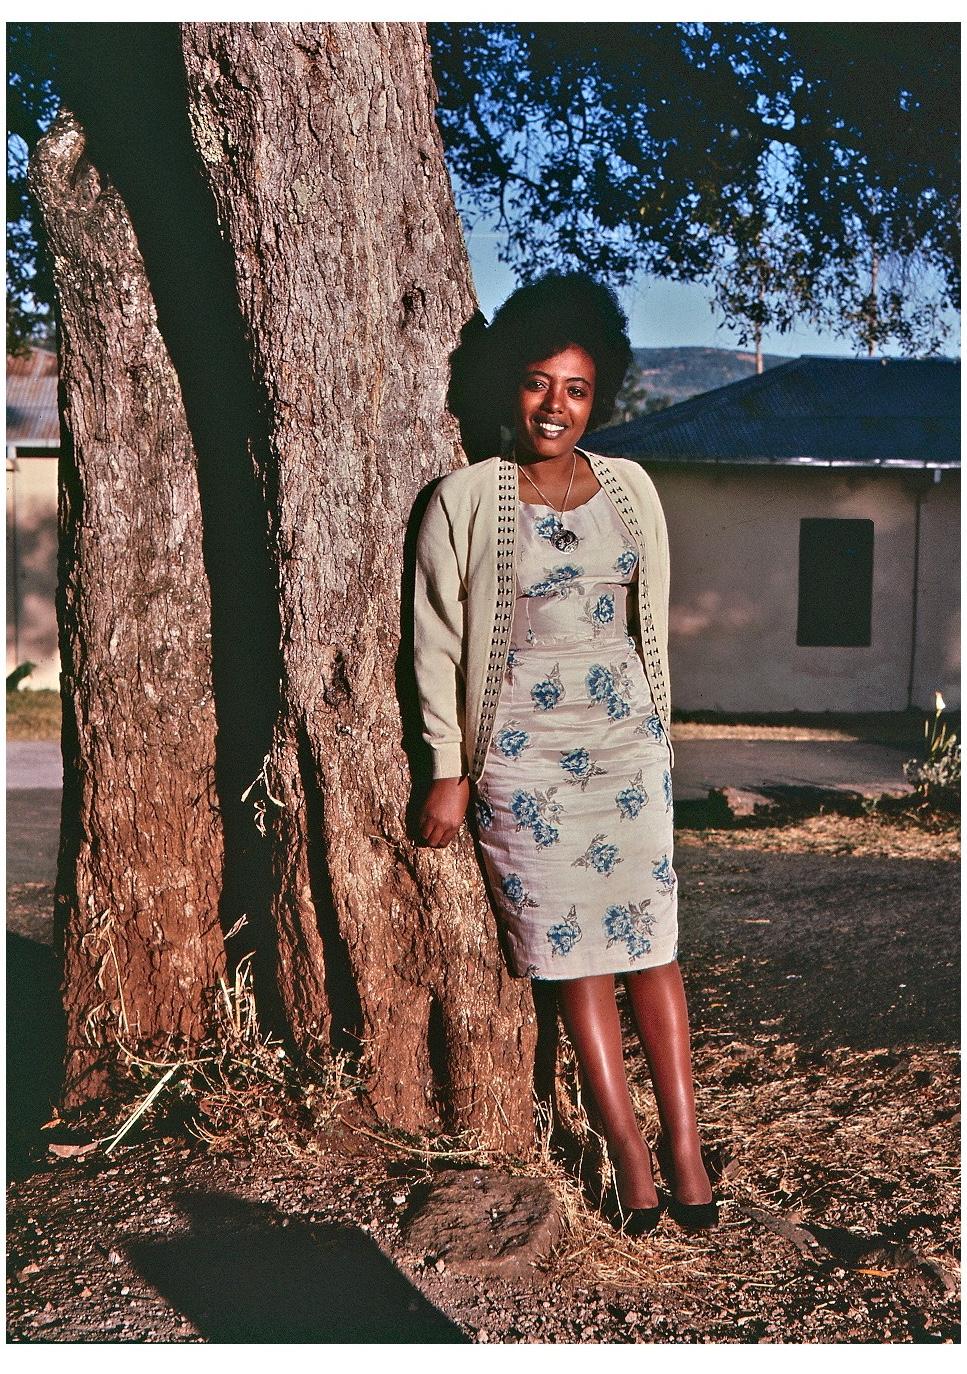 TMS-Students-Photo-taken-1963-1965_9